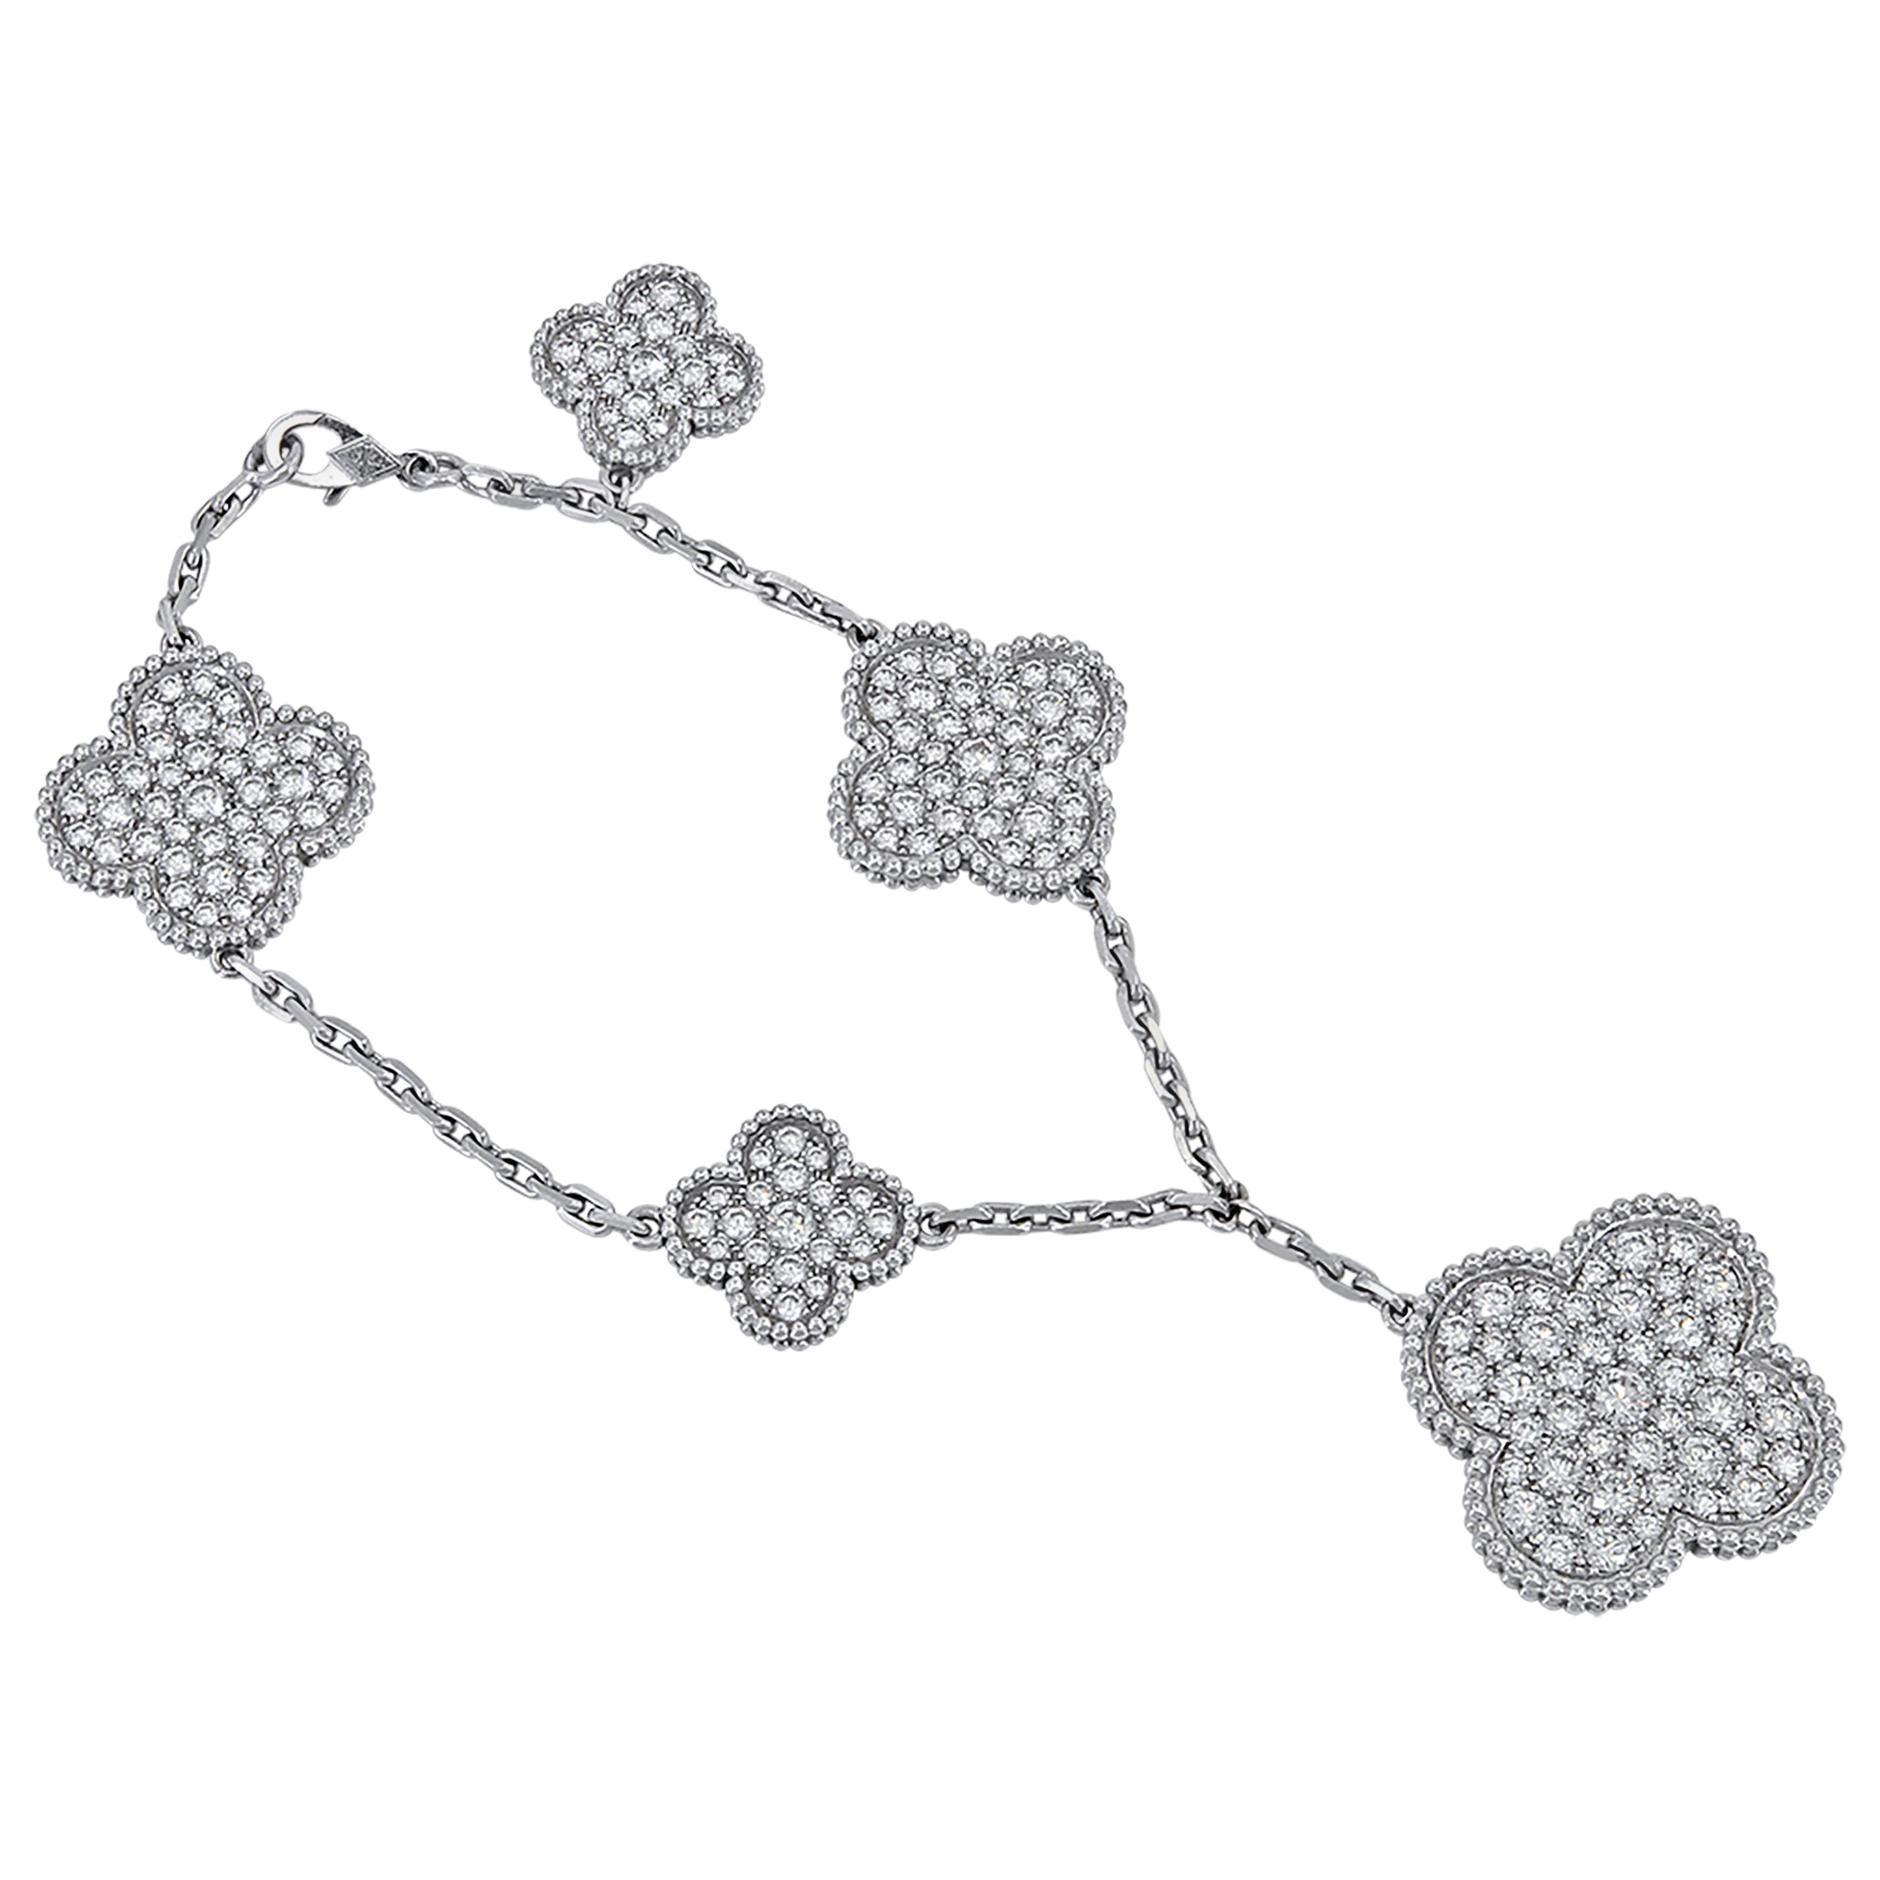 Van Cleef & Arpels Magic Alhambra Bracelet 5 Motifs